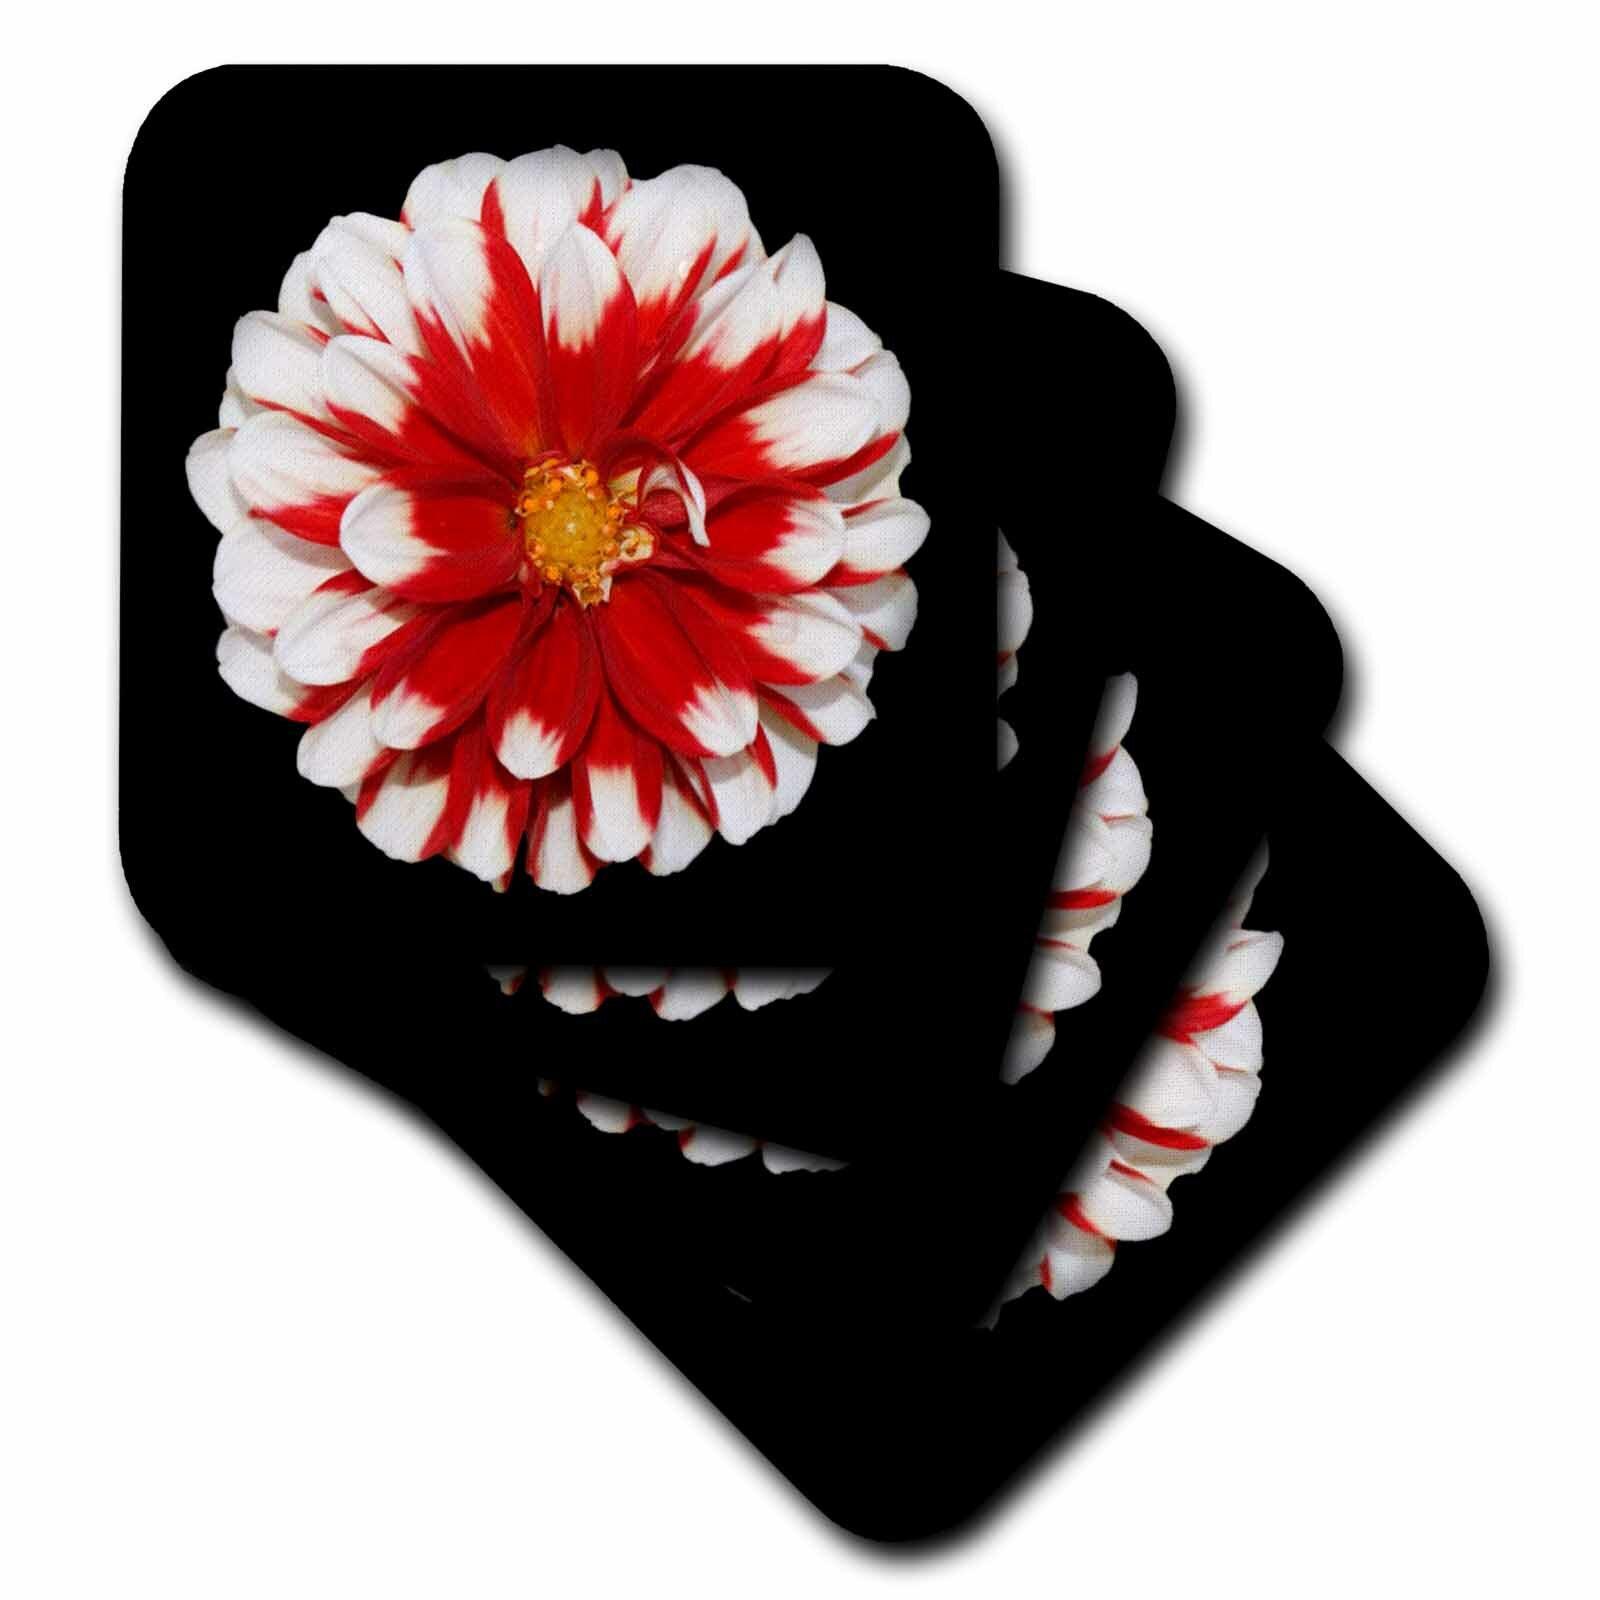 3drose Ceramic Tile Coasters Christmas Flower Set Of 4 Cst 6208 3 Wayfair